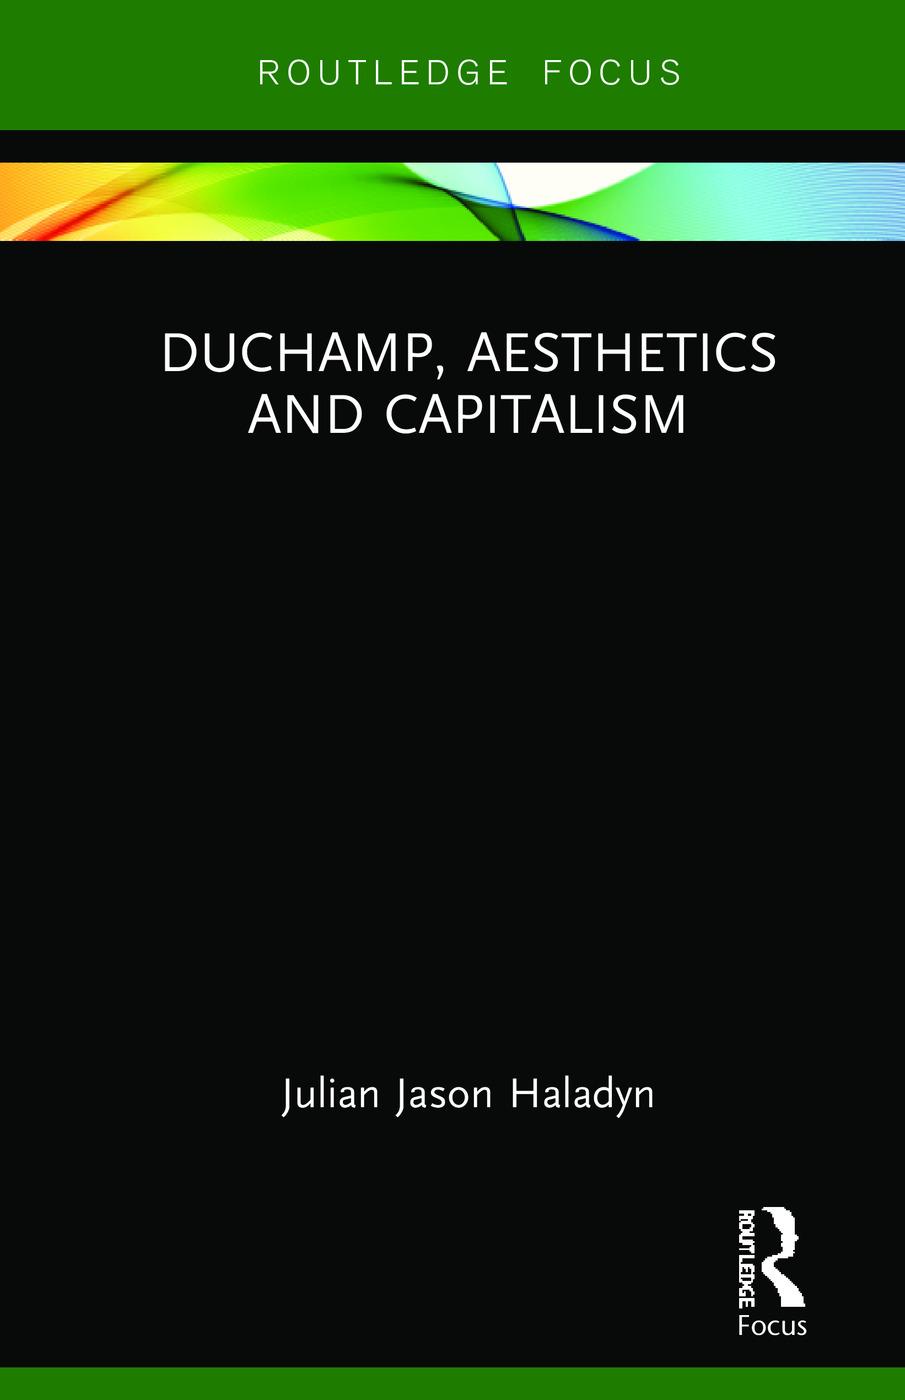 Duchamp, Aesthetics and Capitalism book cover